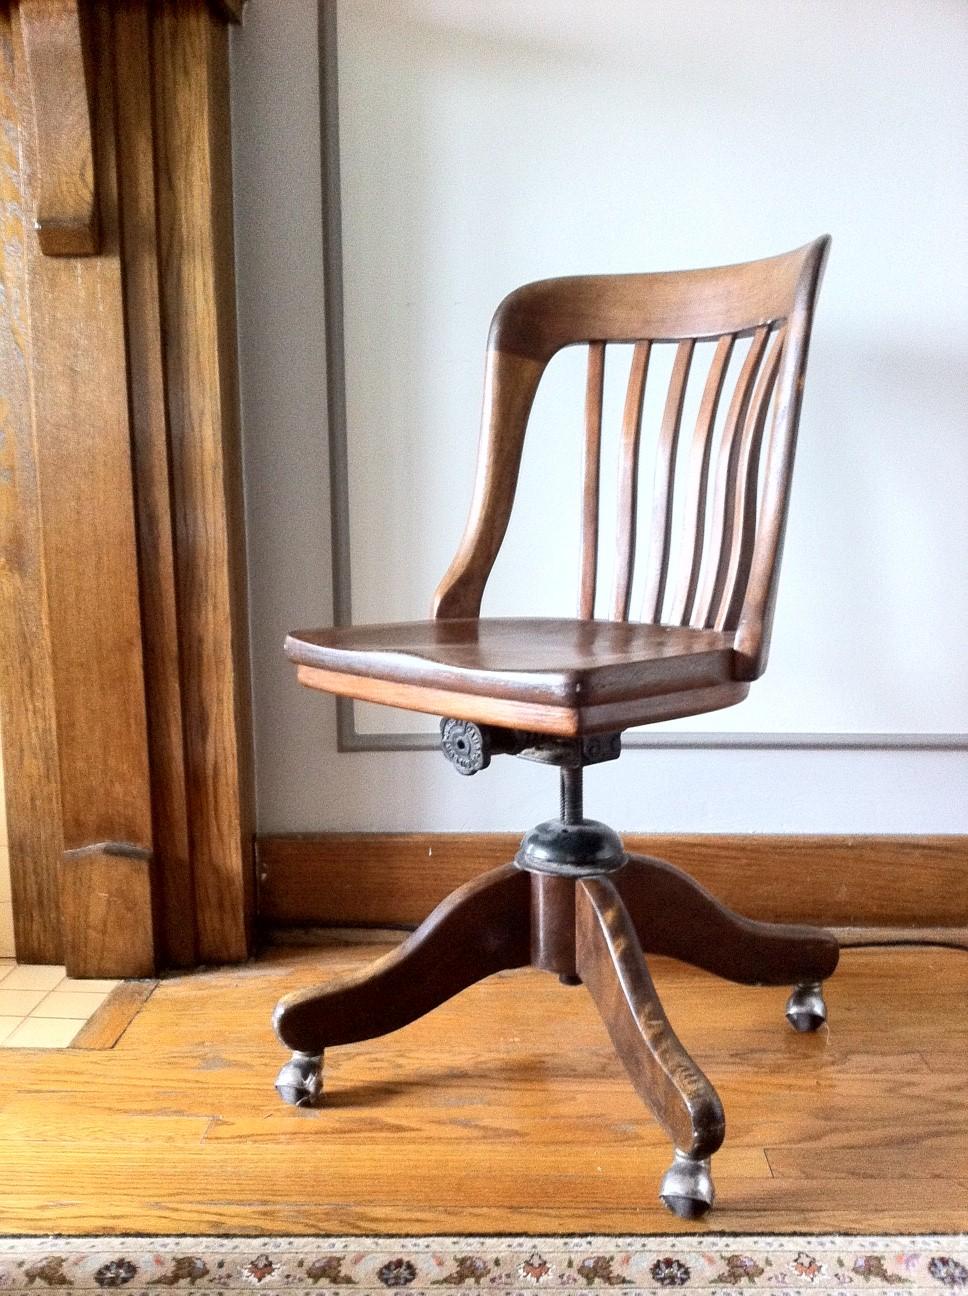 Lady Jane S Treasure Trove Sold 1930s H Krug Furniture